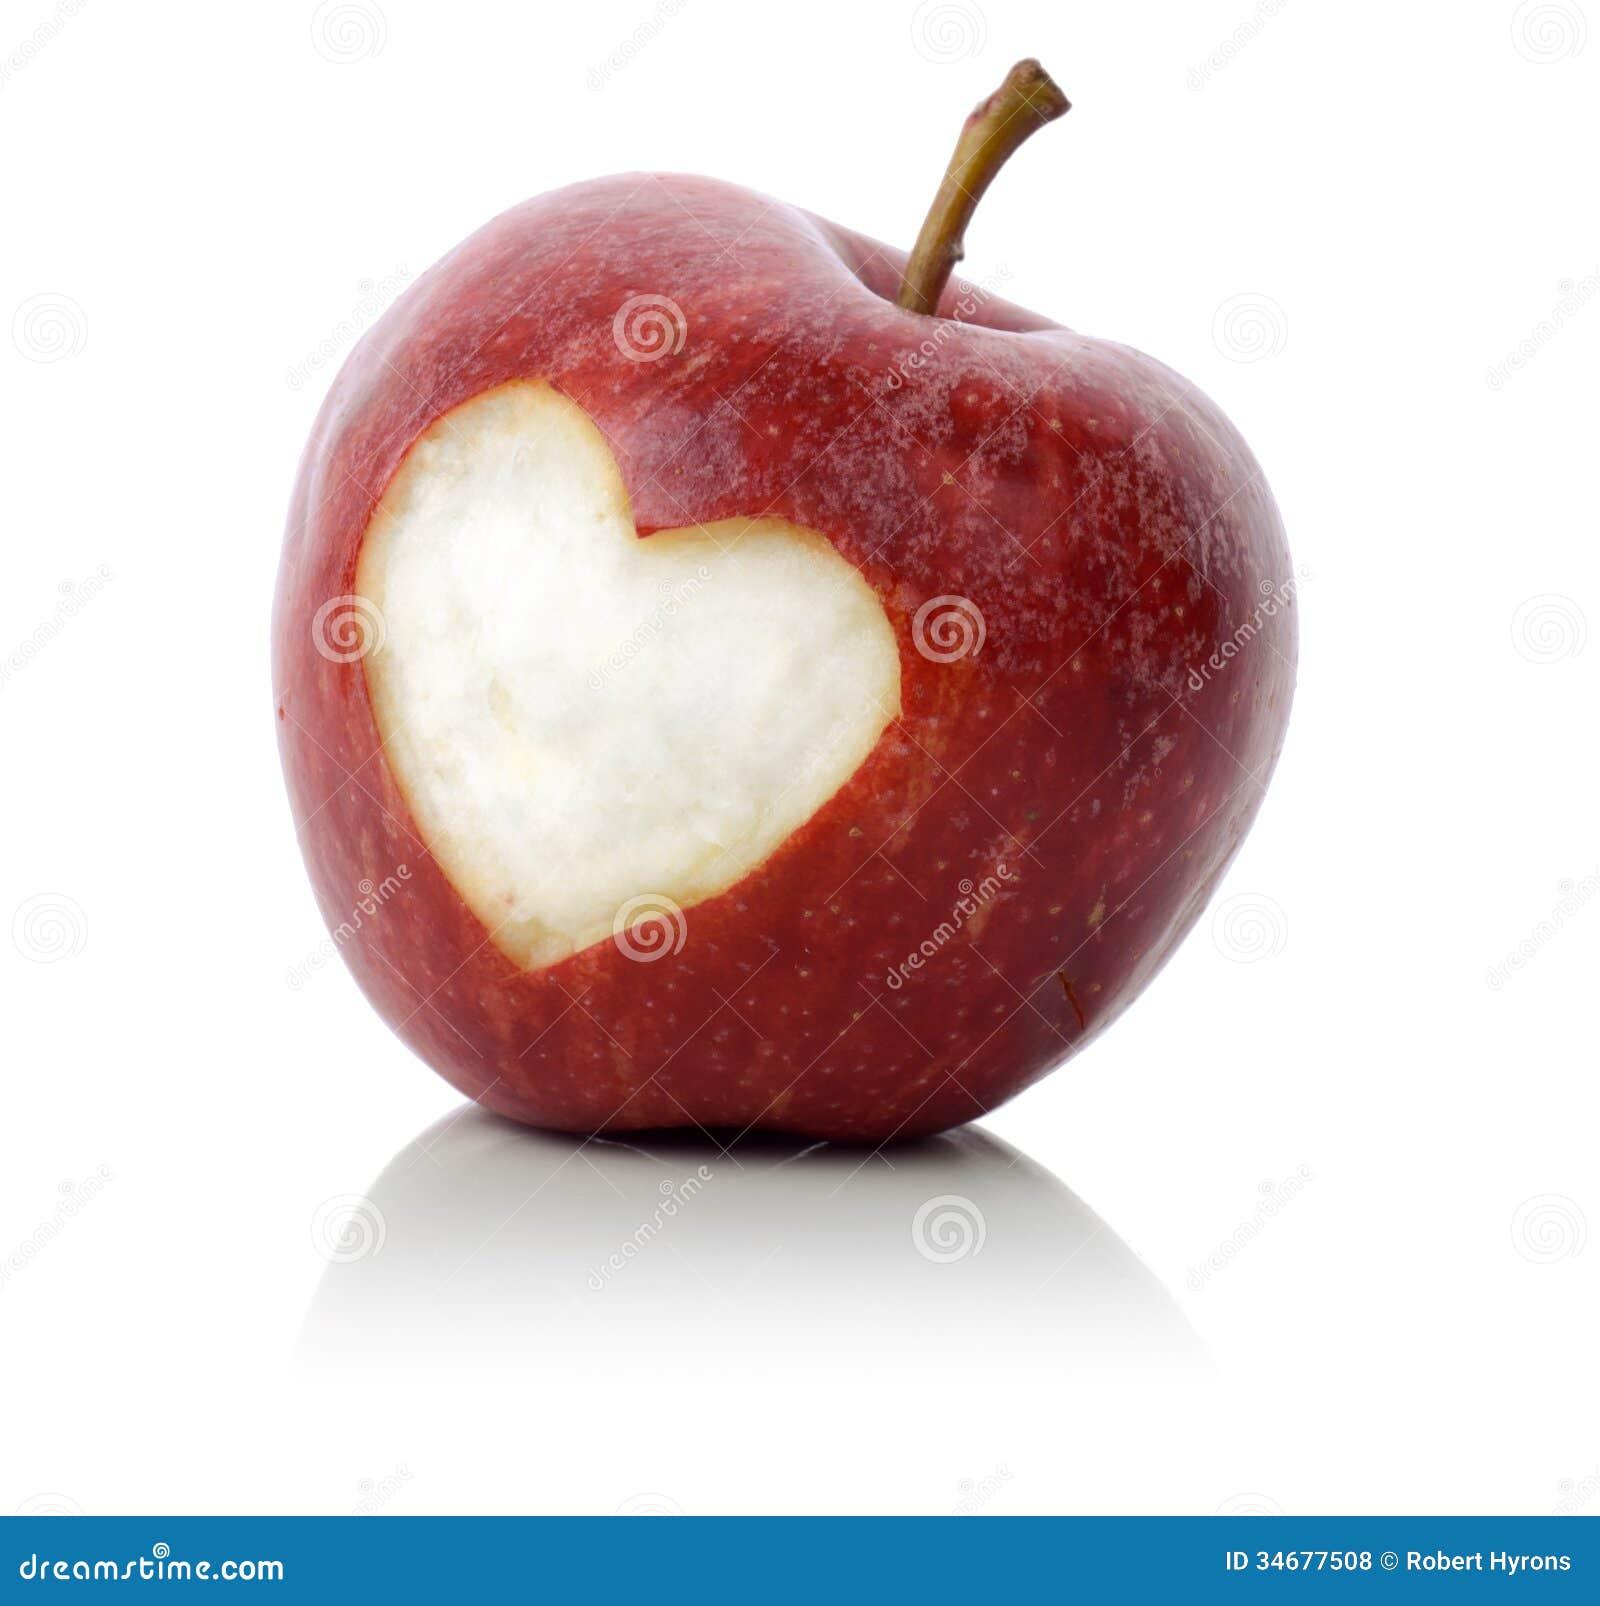 apple food. royalty-free stock photo apple food